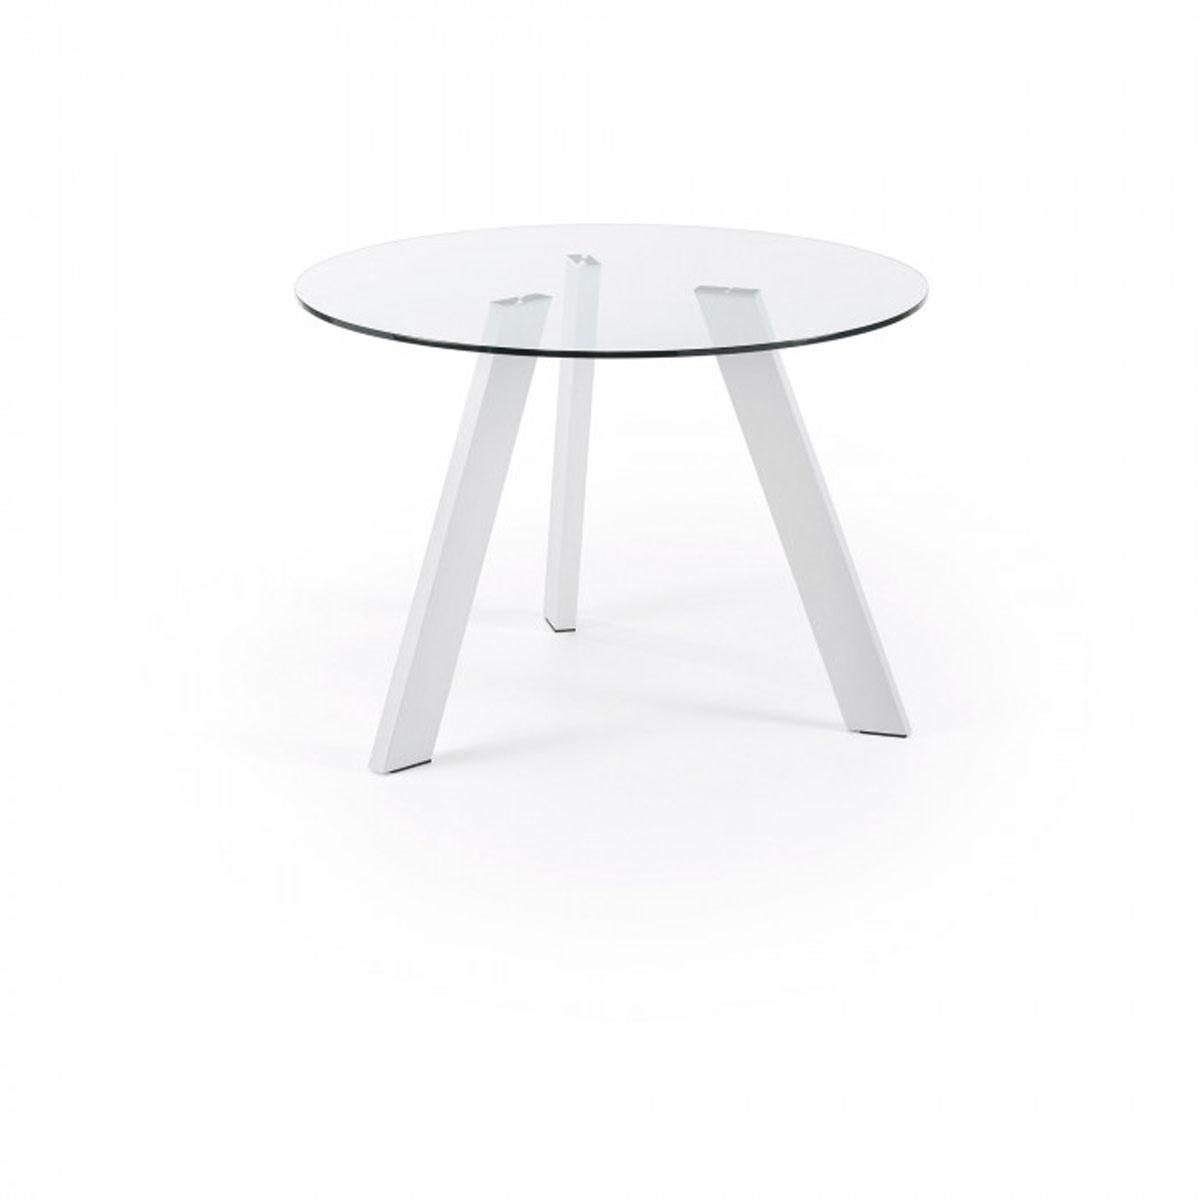 Mesa de comedor redonda acero y cristal. Jhon Artikalia